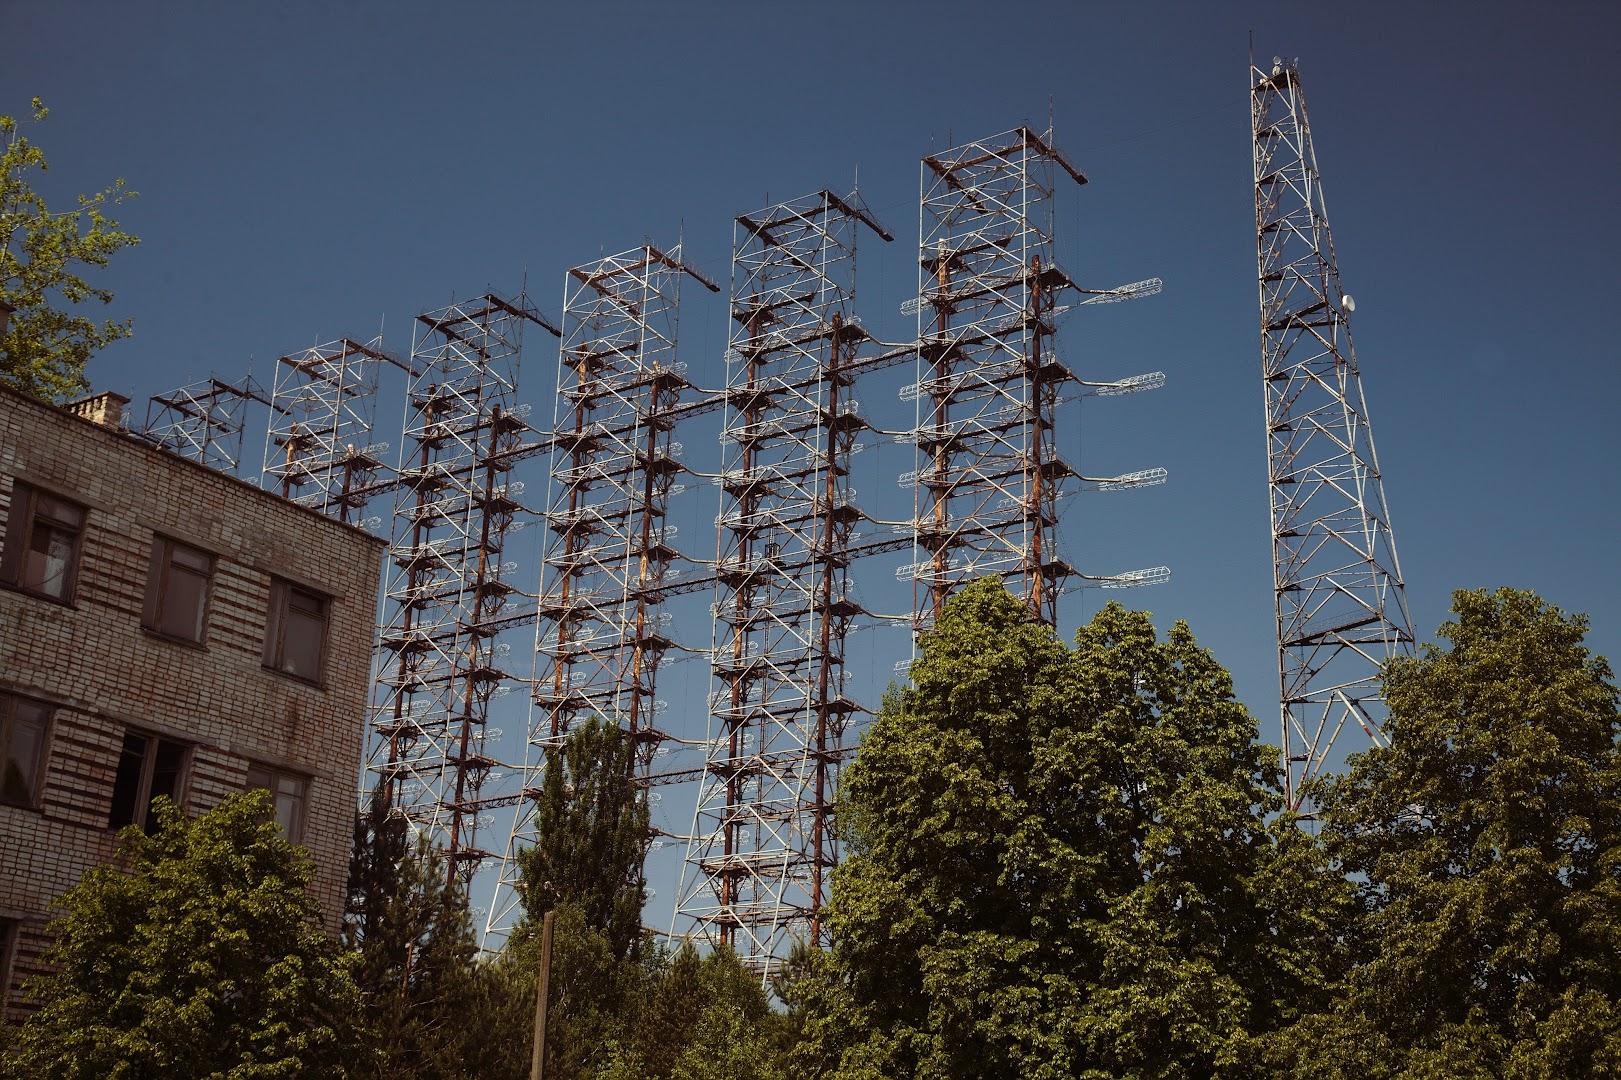 Duga-2 (aka Chernobyl-2) - Soviet transatlantic missile detection grid